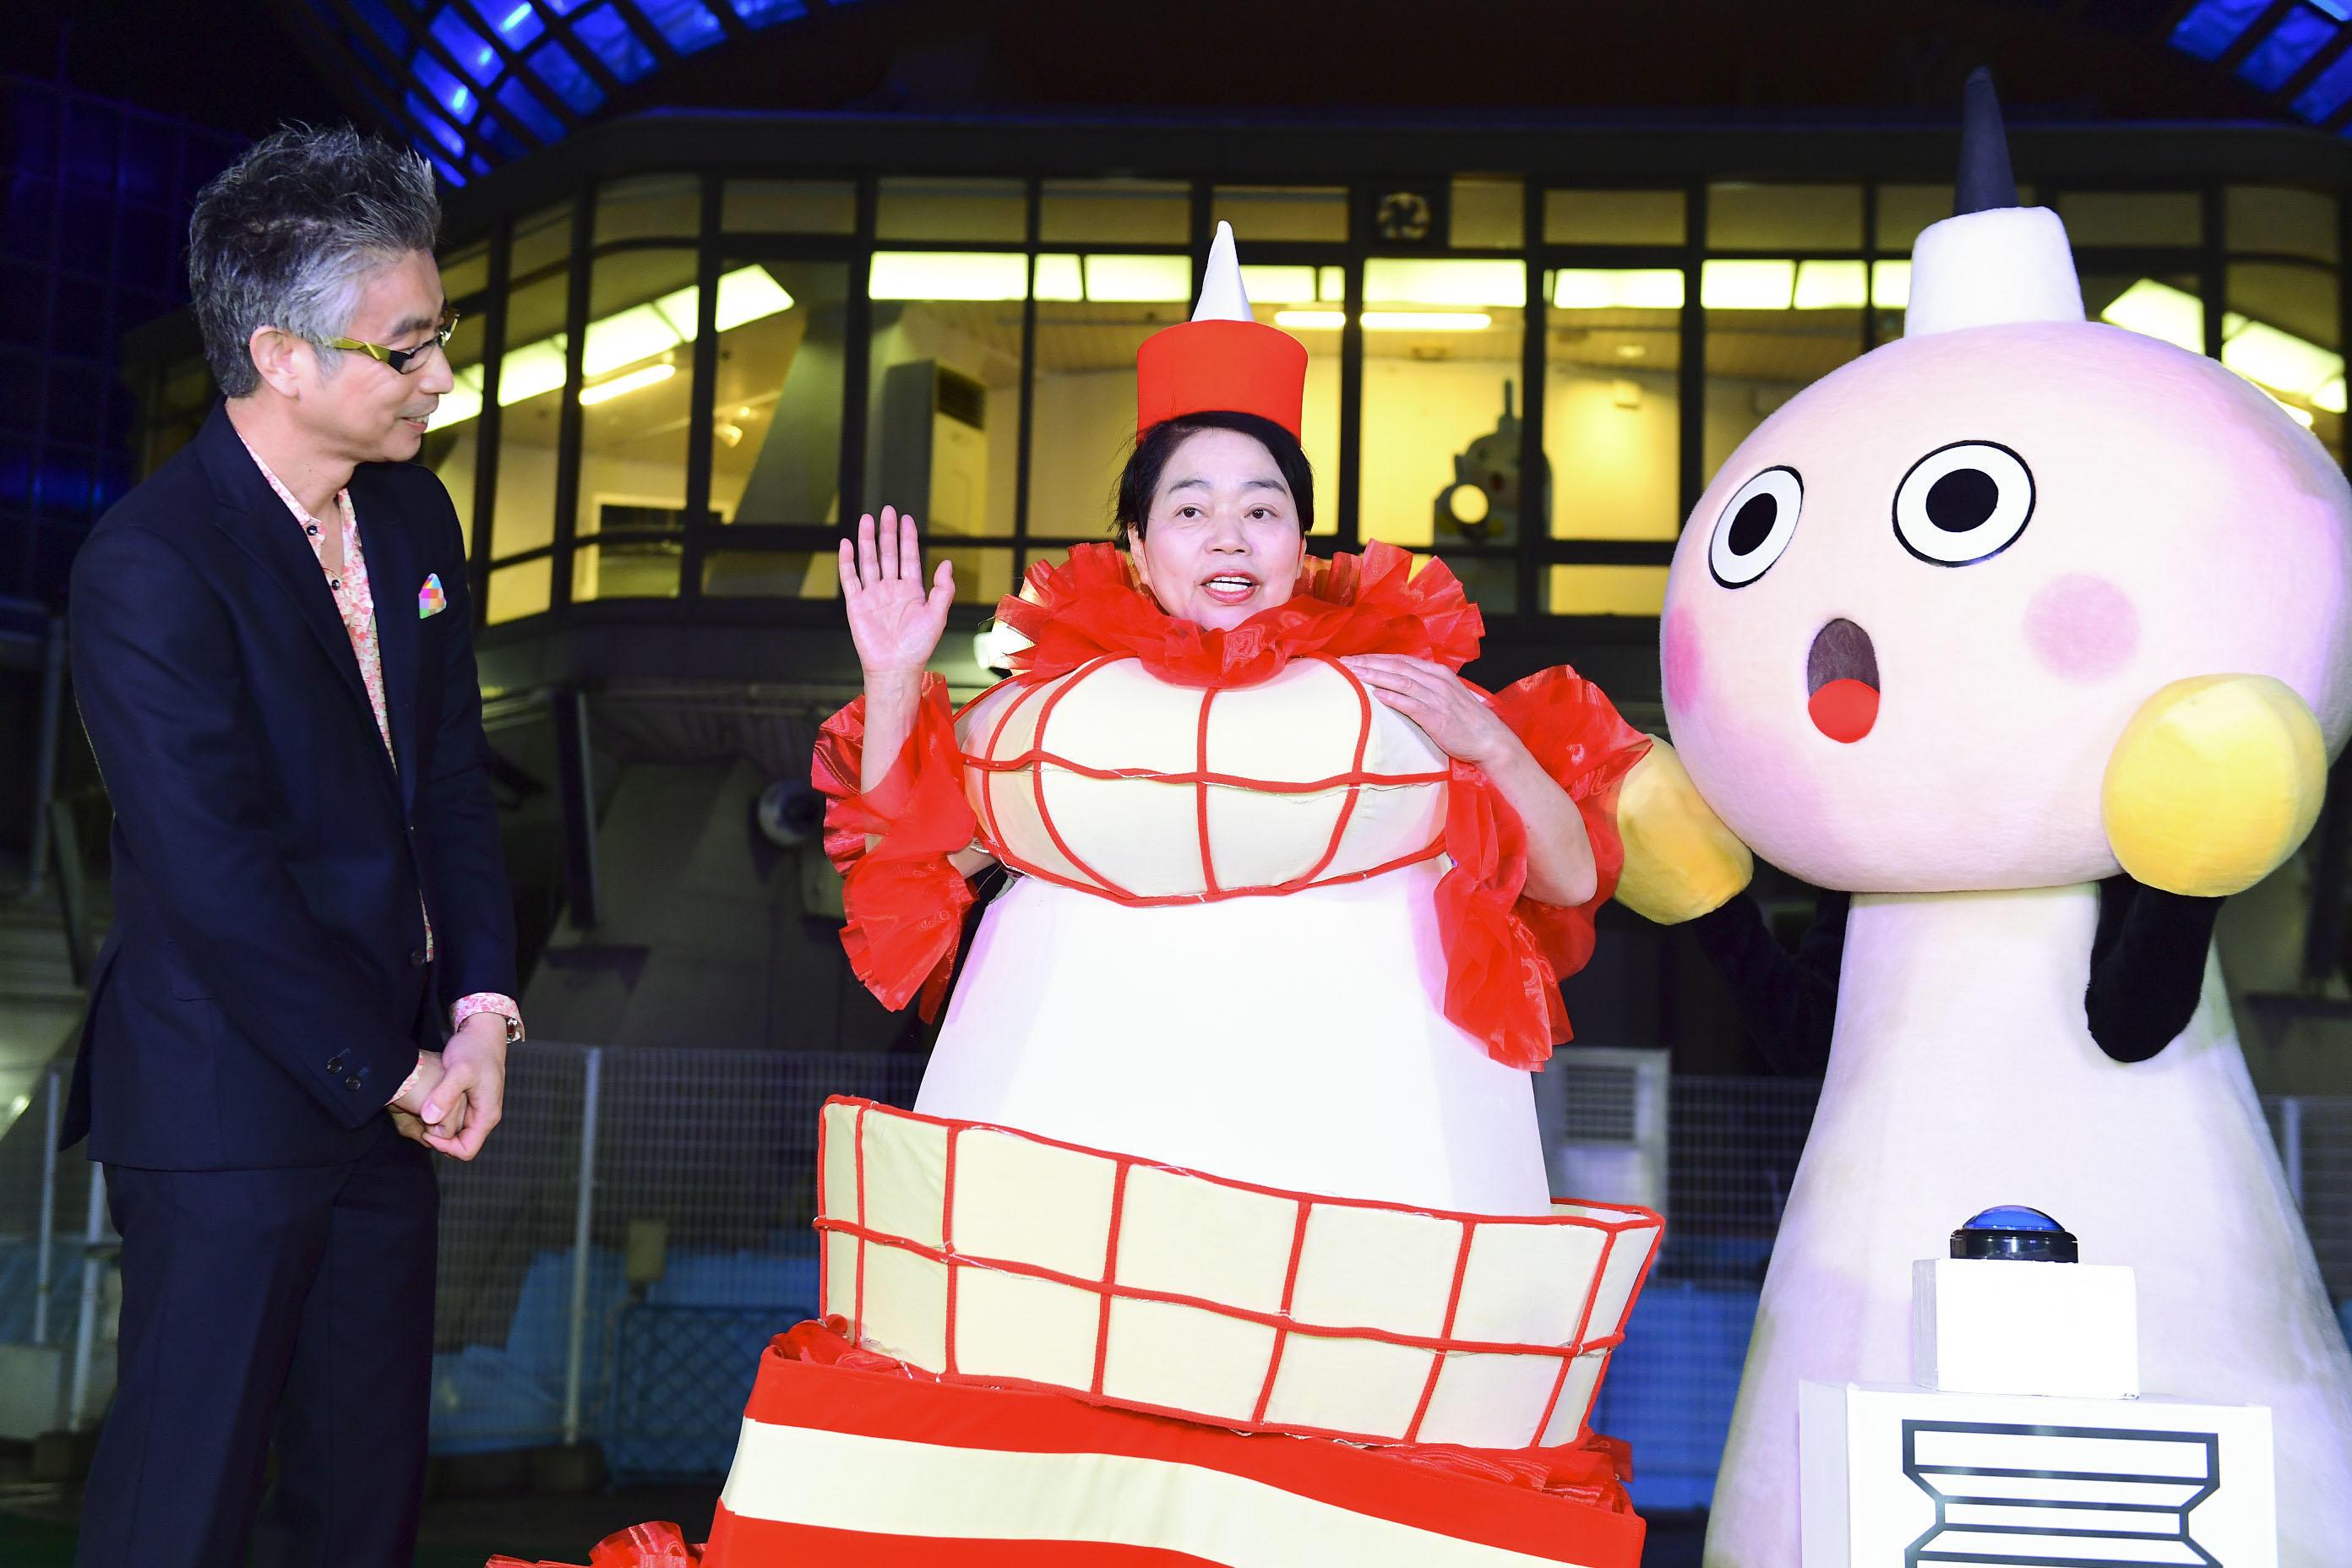 http://news.yoshimoto.co.jp/20171005202310-6d74bef2e0afb7bf5f6a562834a8bd83e8db417f.jpg